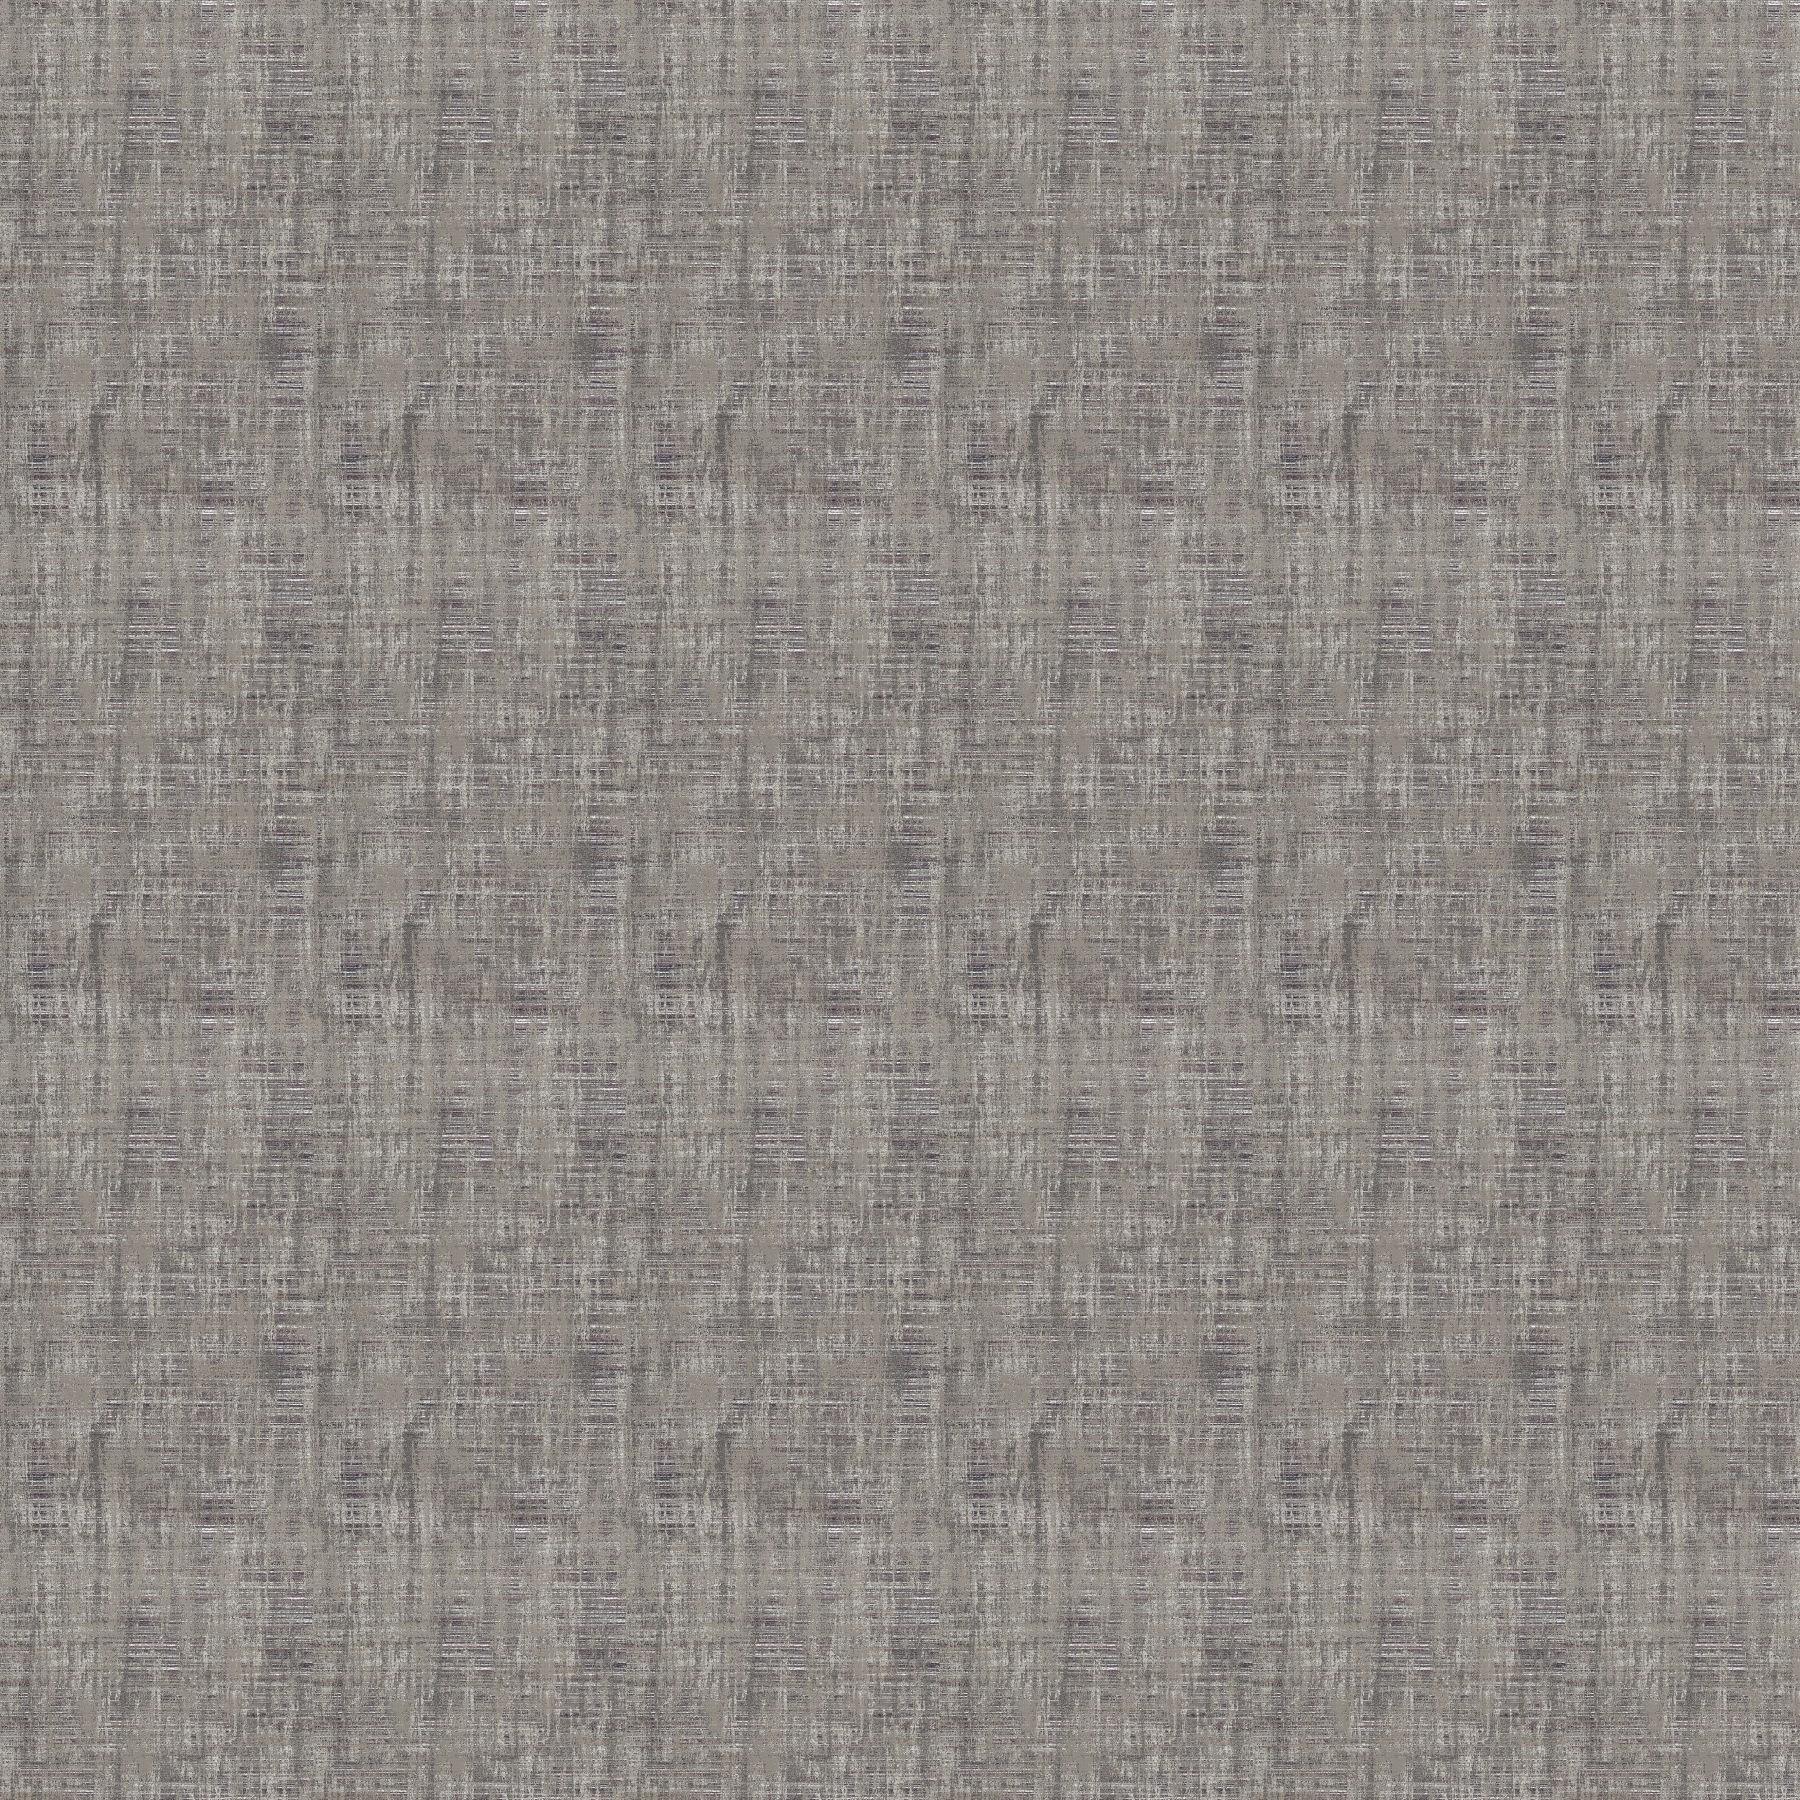 Decoration Fabric Kalahari 9 7877 021 Jab Anstoetz Fabrics